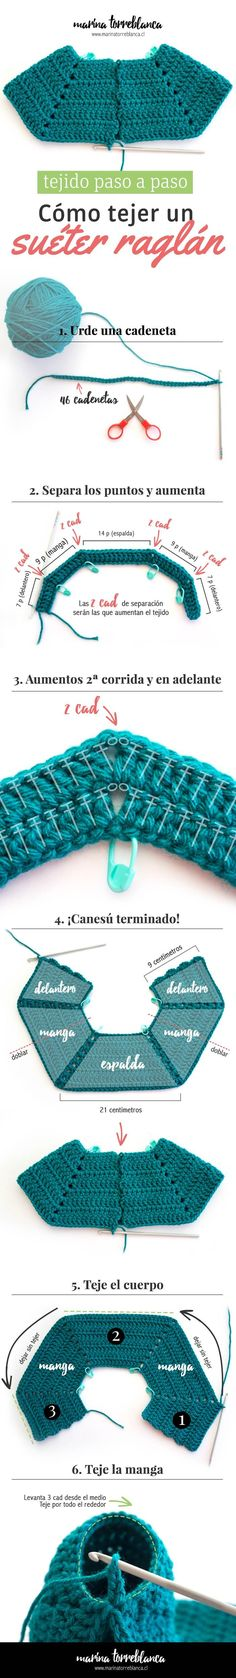 54 Ideas Crochet Baby Sweater Measurements Free Pattern For 2019 Crochet Girls, Crochet Baby Clothes, Crochet For Kids, Knit Crochet, Crochet Chart, Crochet Stitches, Baby Knitting Patterns, Crochet Patterns, Amigurumi Patterns